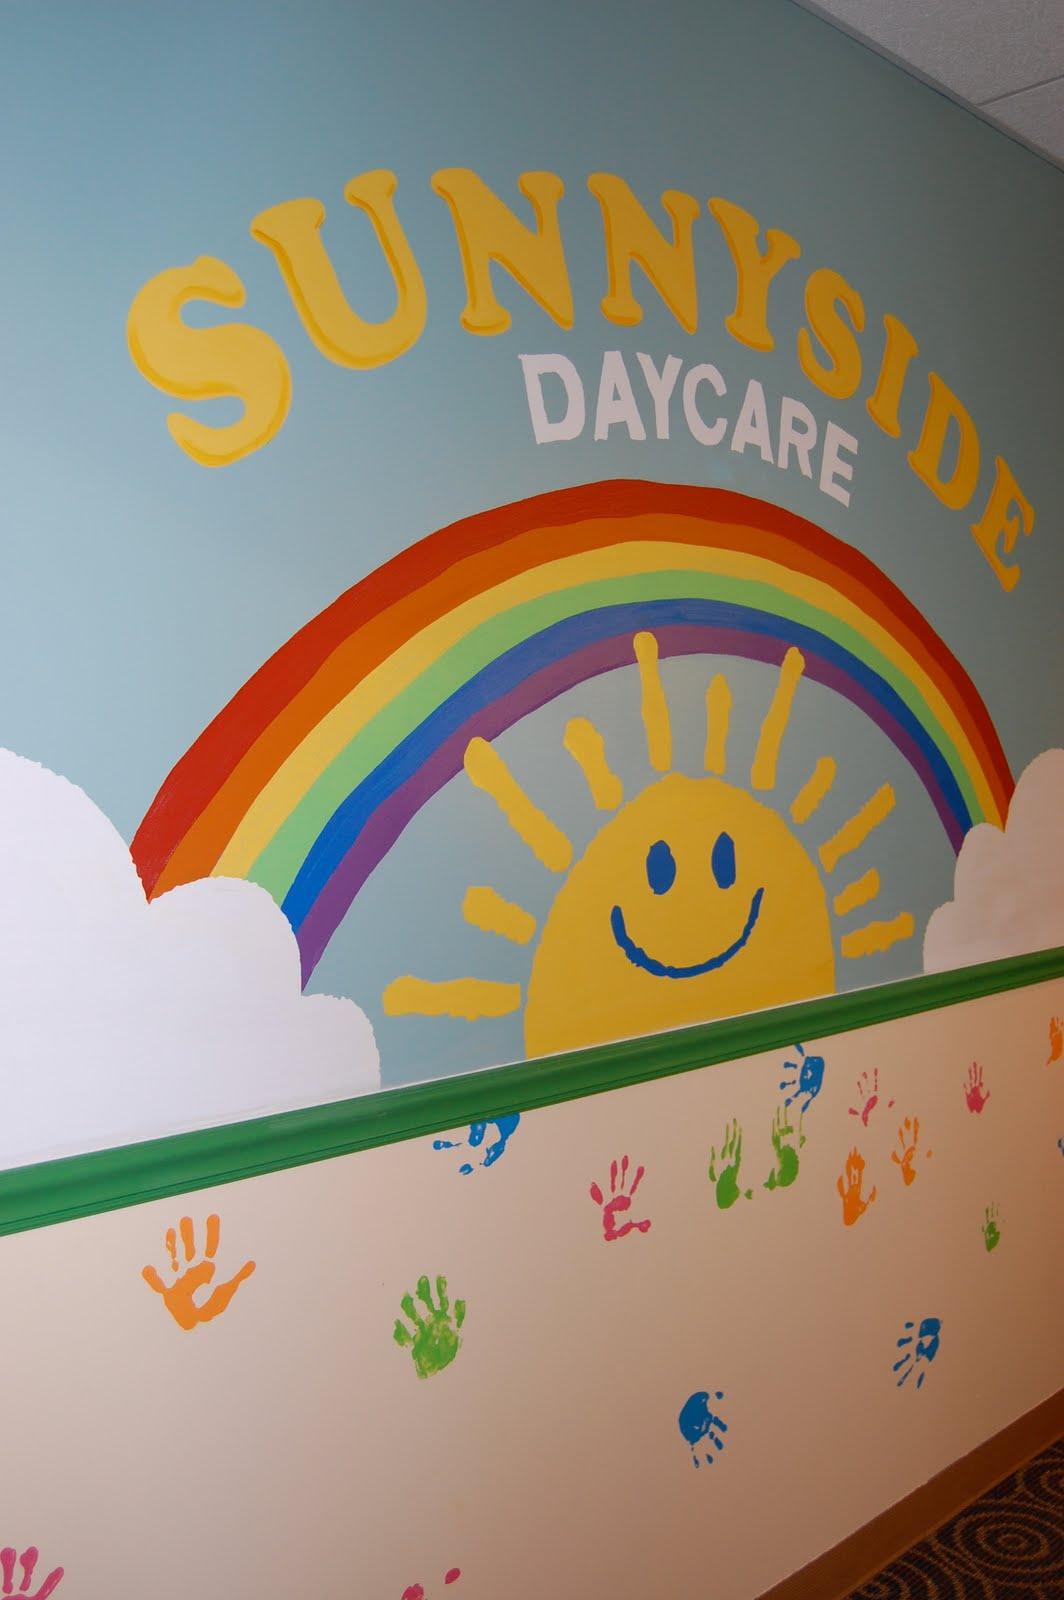 Toy Story 3 Sunnyside Daycare : Disneyshawn meet lotso